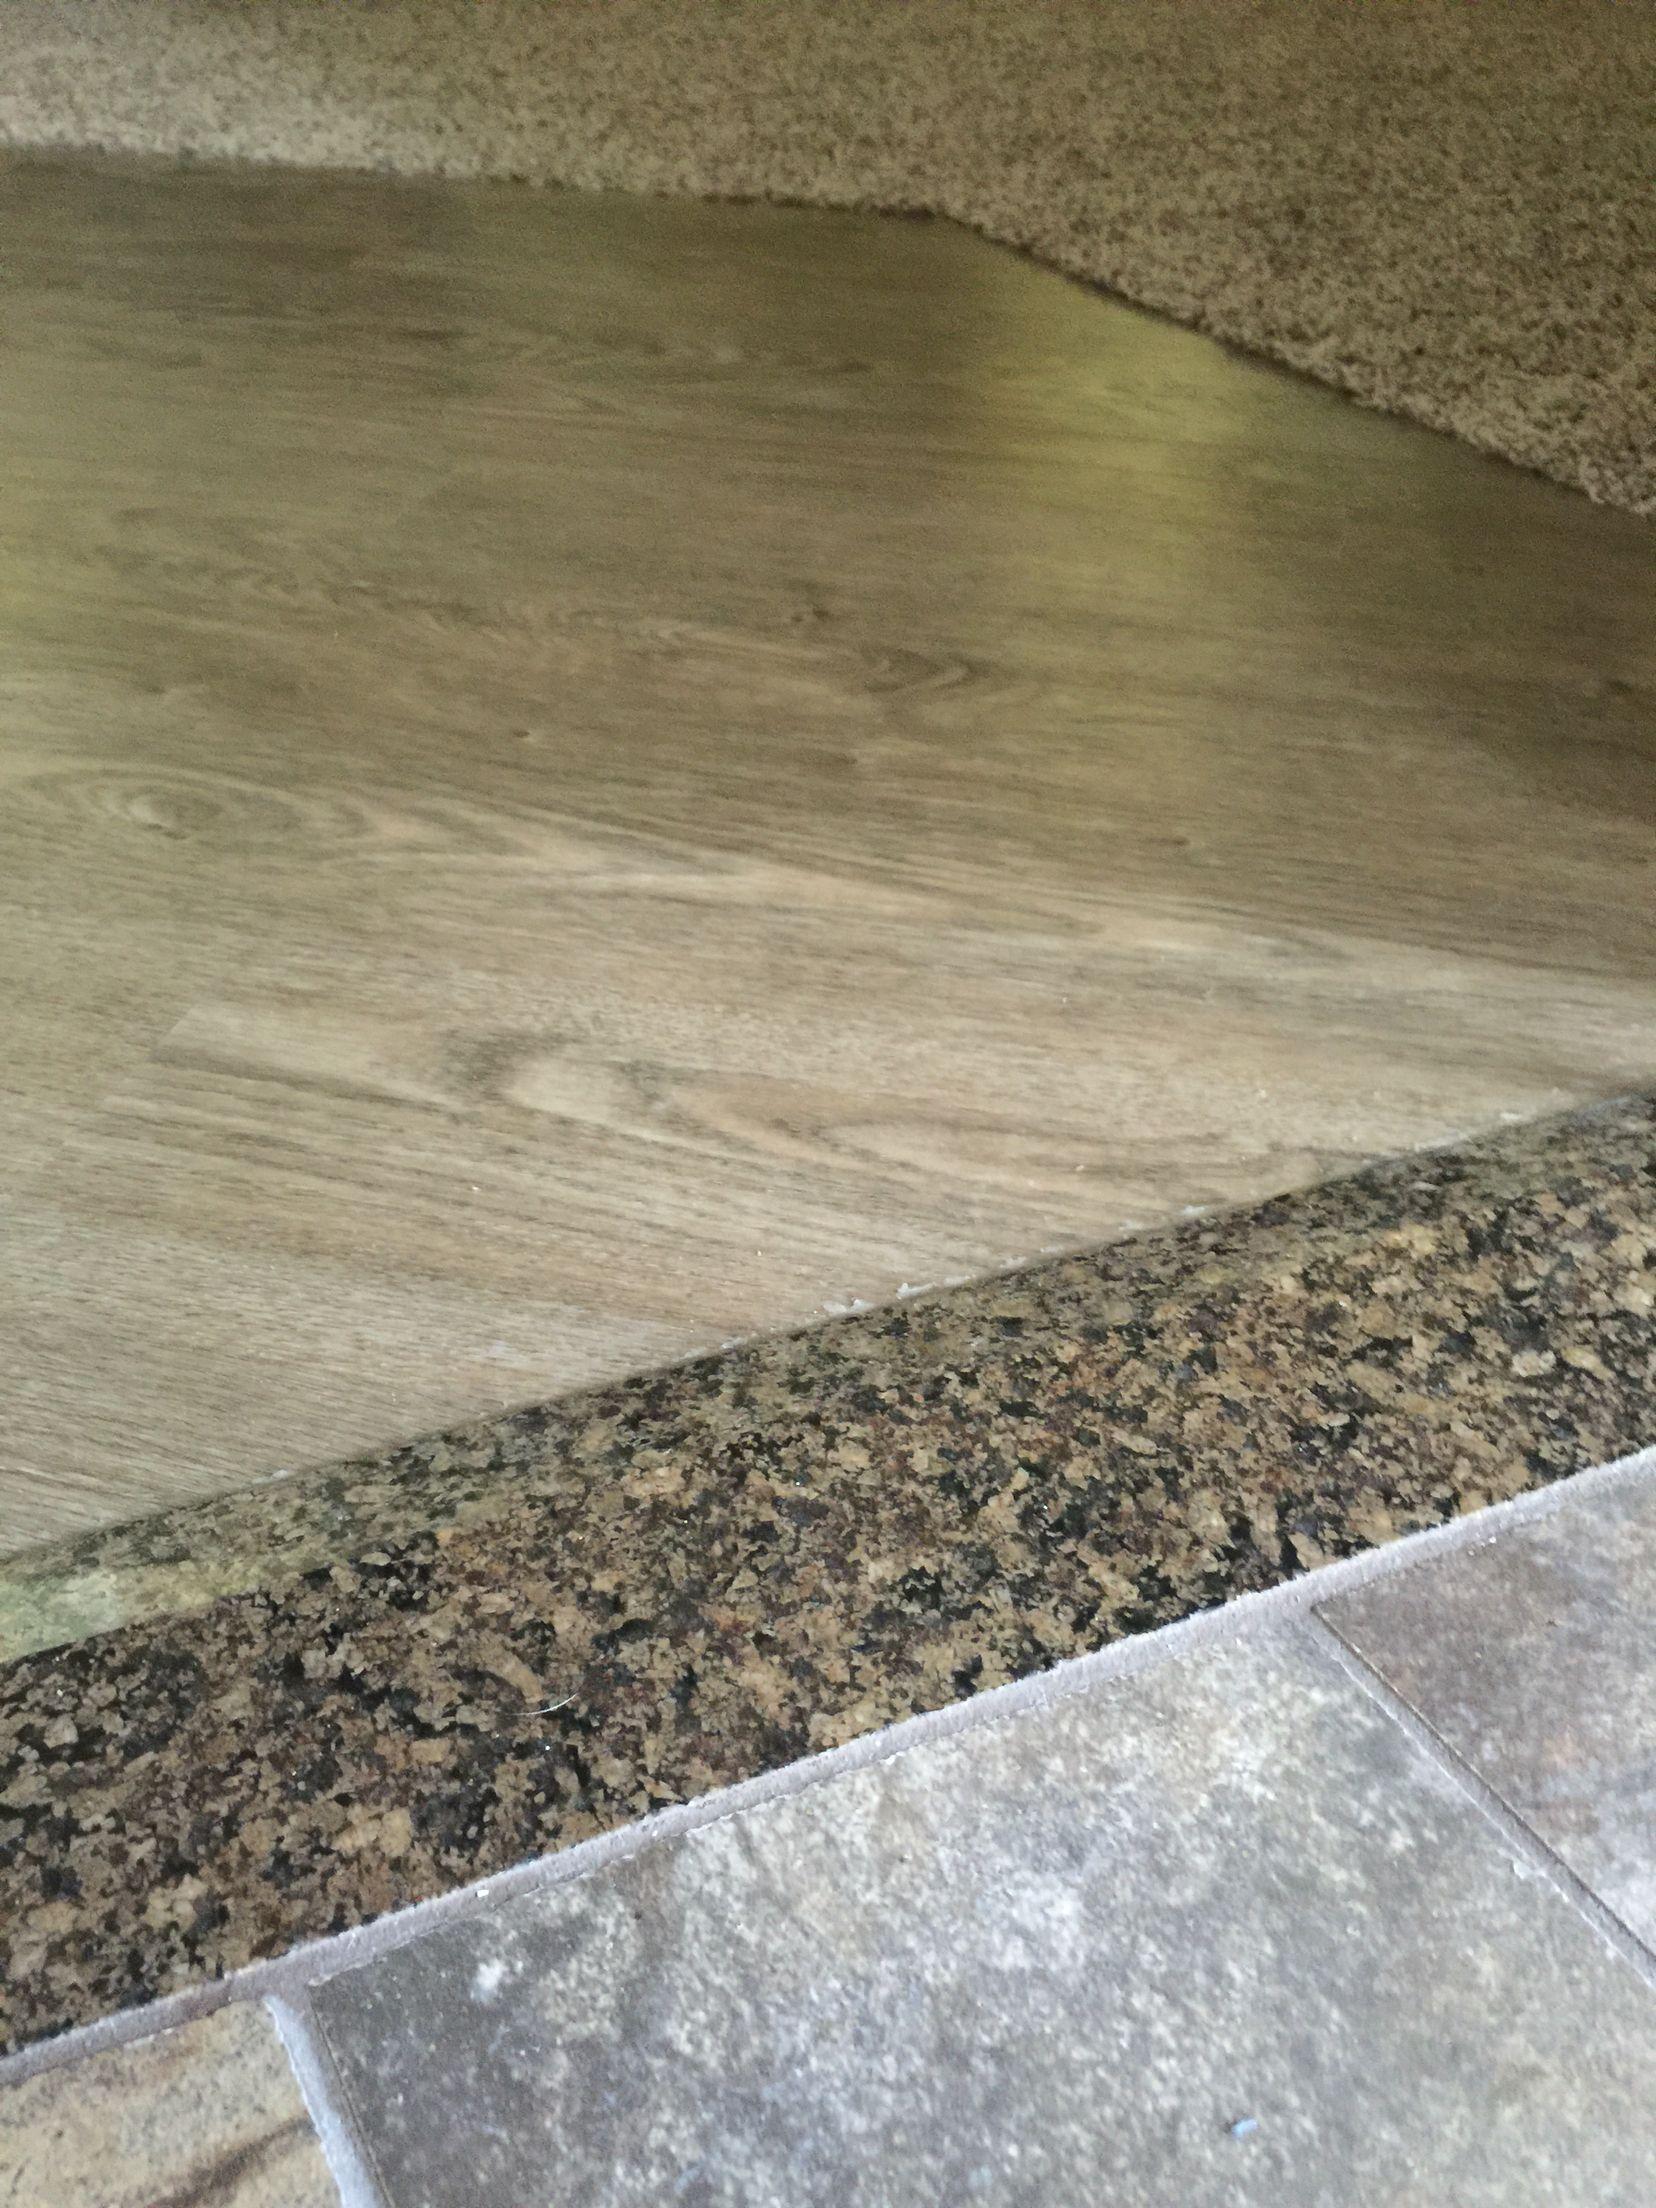 Transition To Master Bathroom To Master Bedroom Tile Granite To Vinyl Plank To Carpet Floor Remodel Shower Remodel Granite Shower